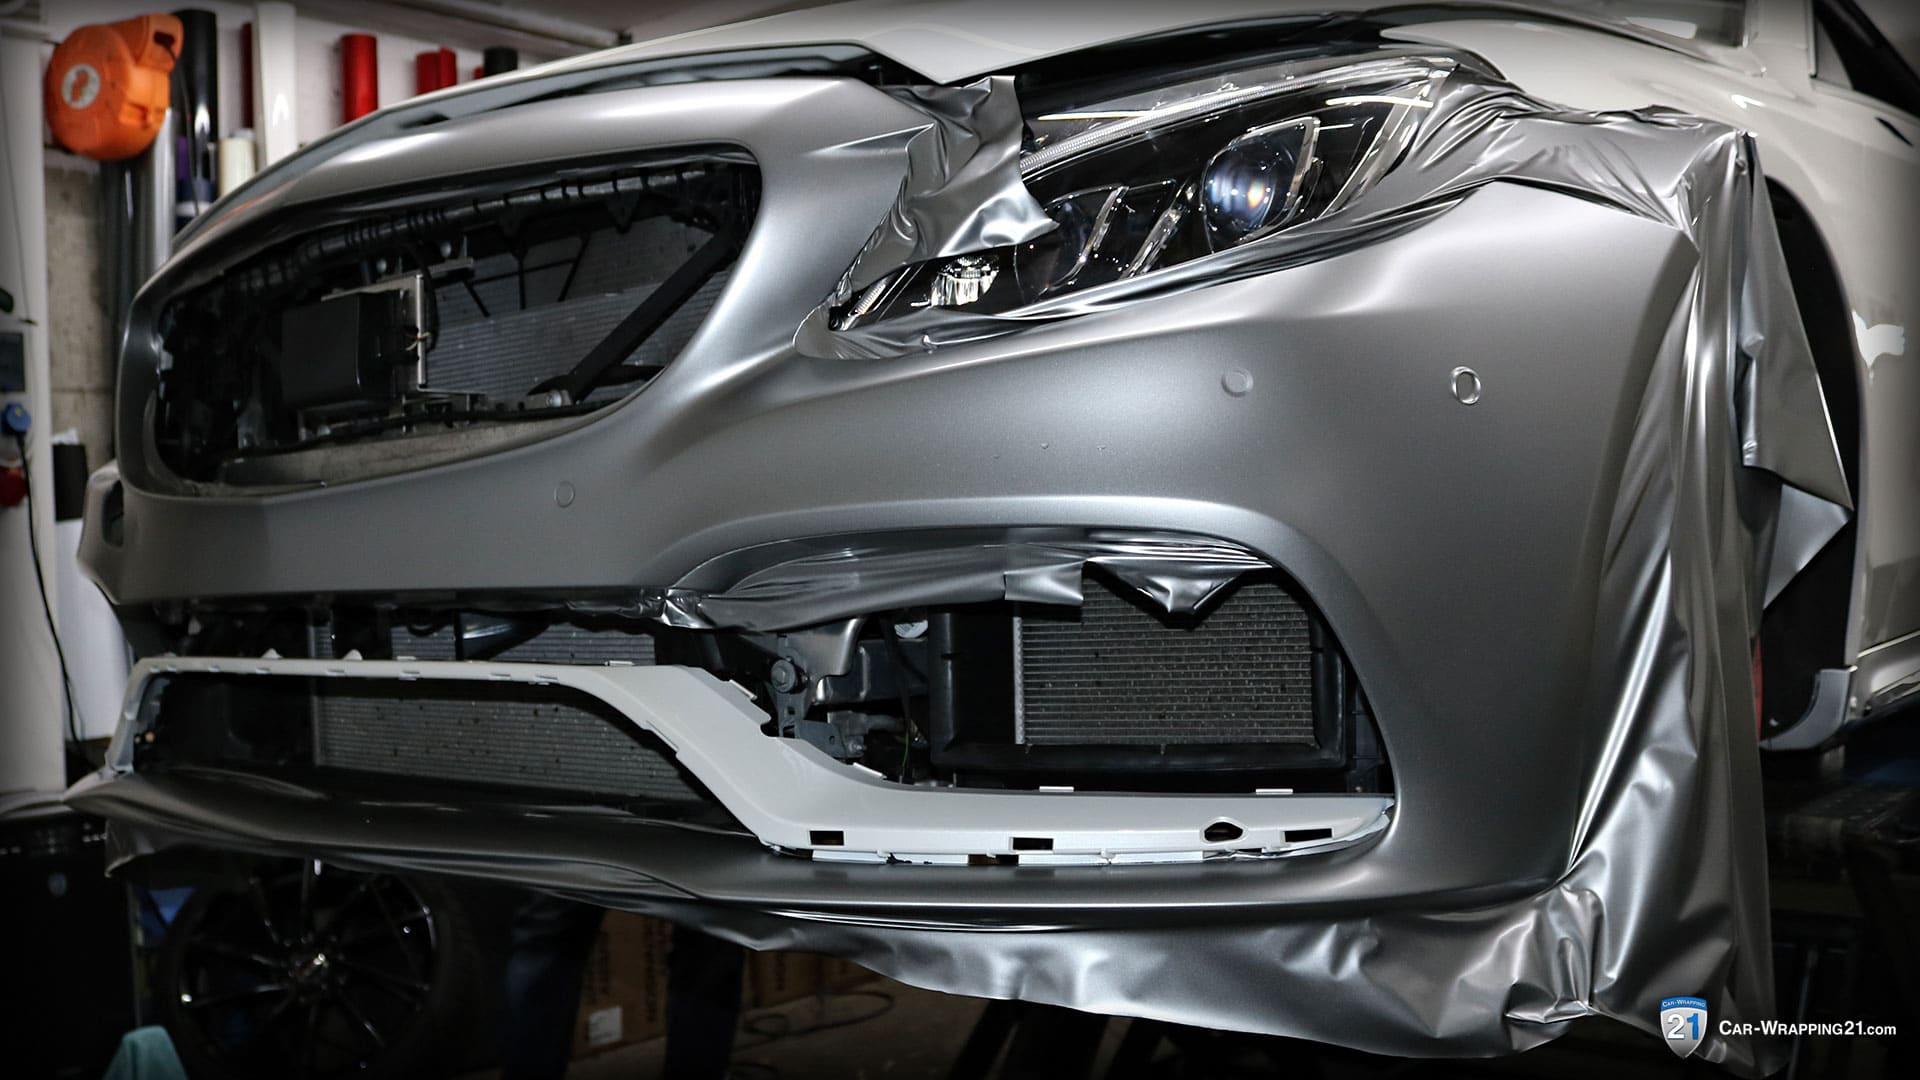 Mercedes-Benz-C63-Amg-Vollfolierung-Avery Satin Metallic Light Grey V8-Cabrio-2016